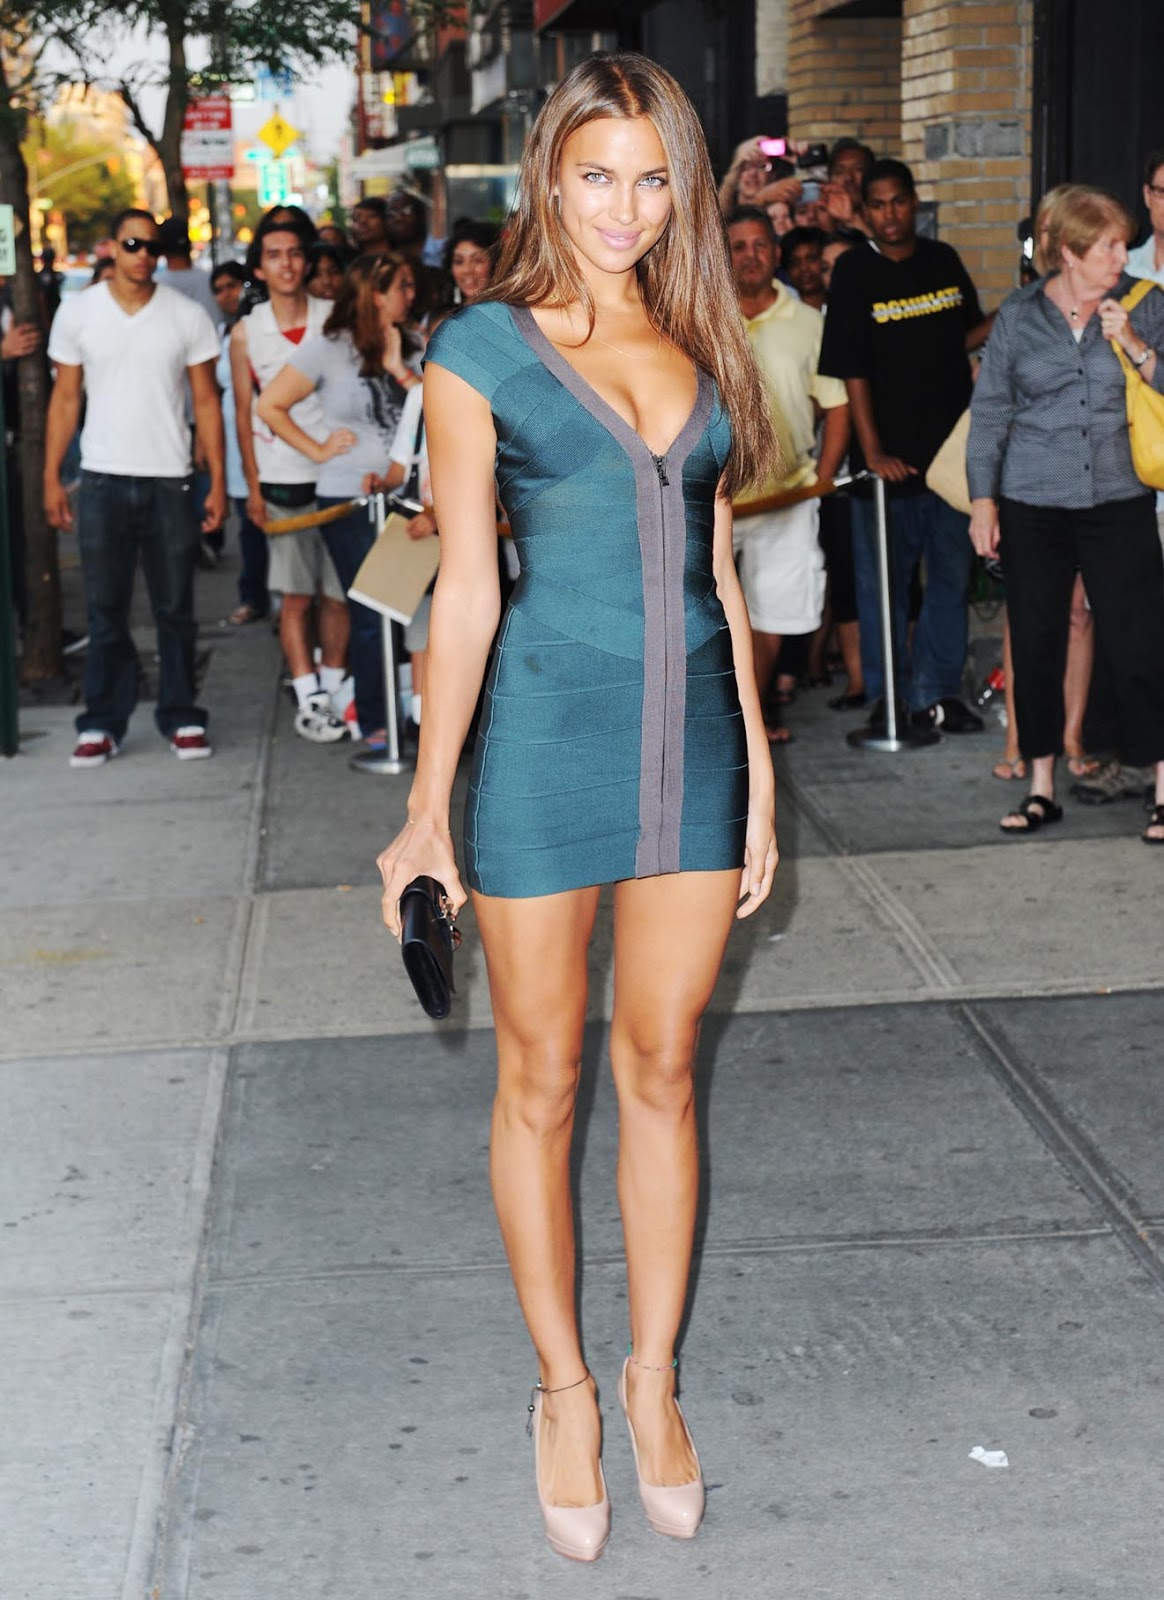 http://4.bp.blogspot.com/-fuarXrSLxxg/Tz_q81TY8BI/AAAAAAAACkM/pMp4AblnkeM/s1600/irina-shayk-dress-1.jpg